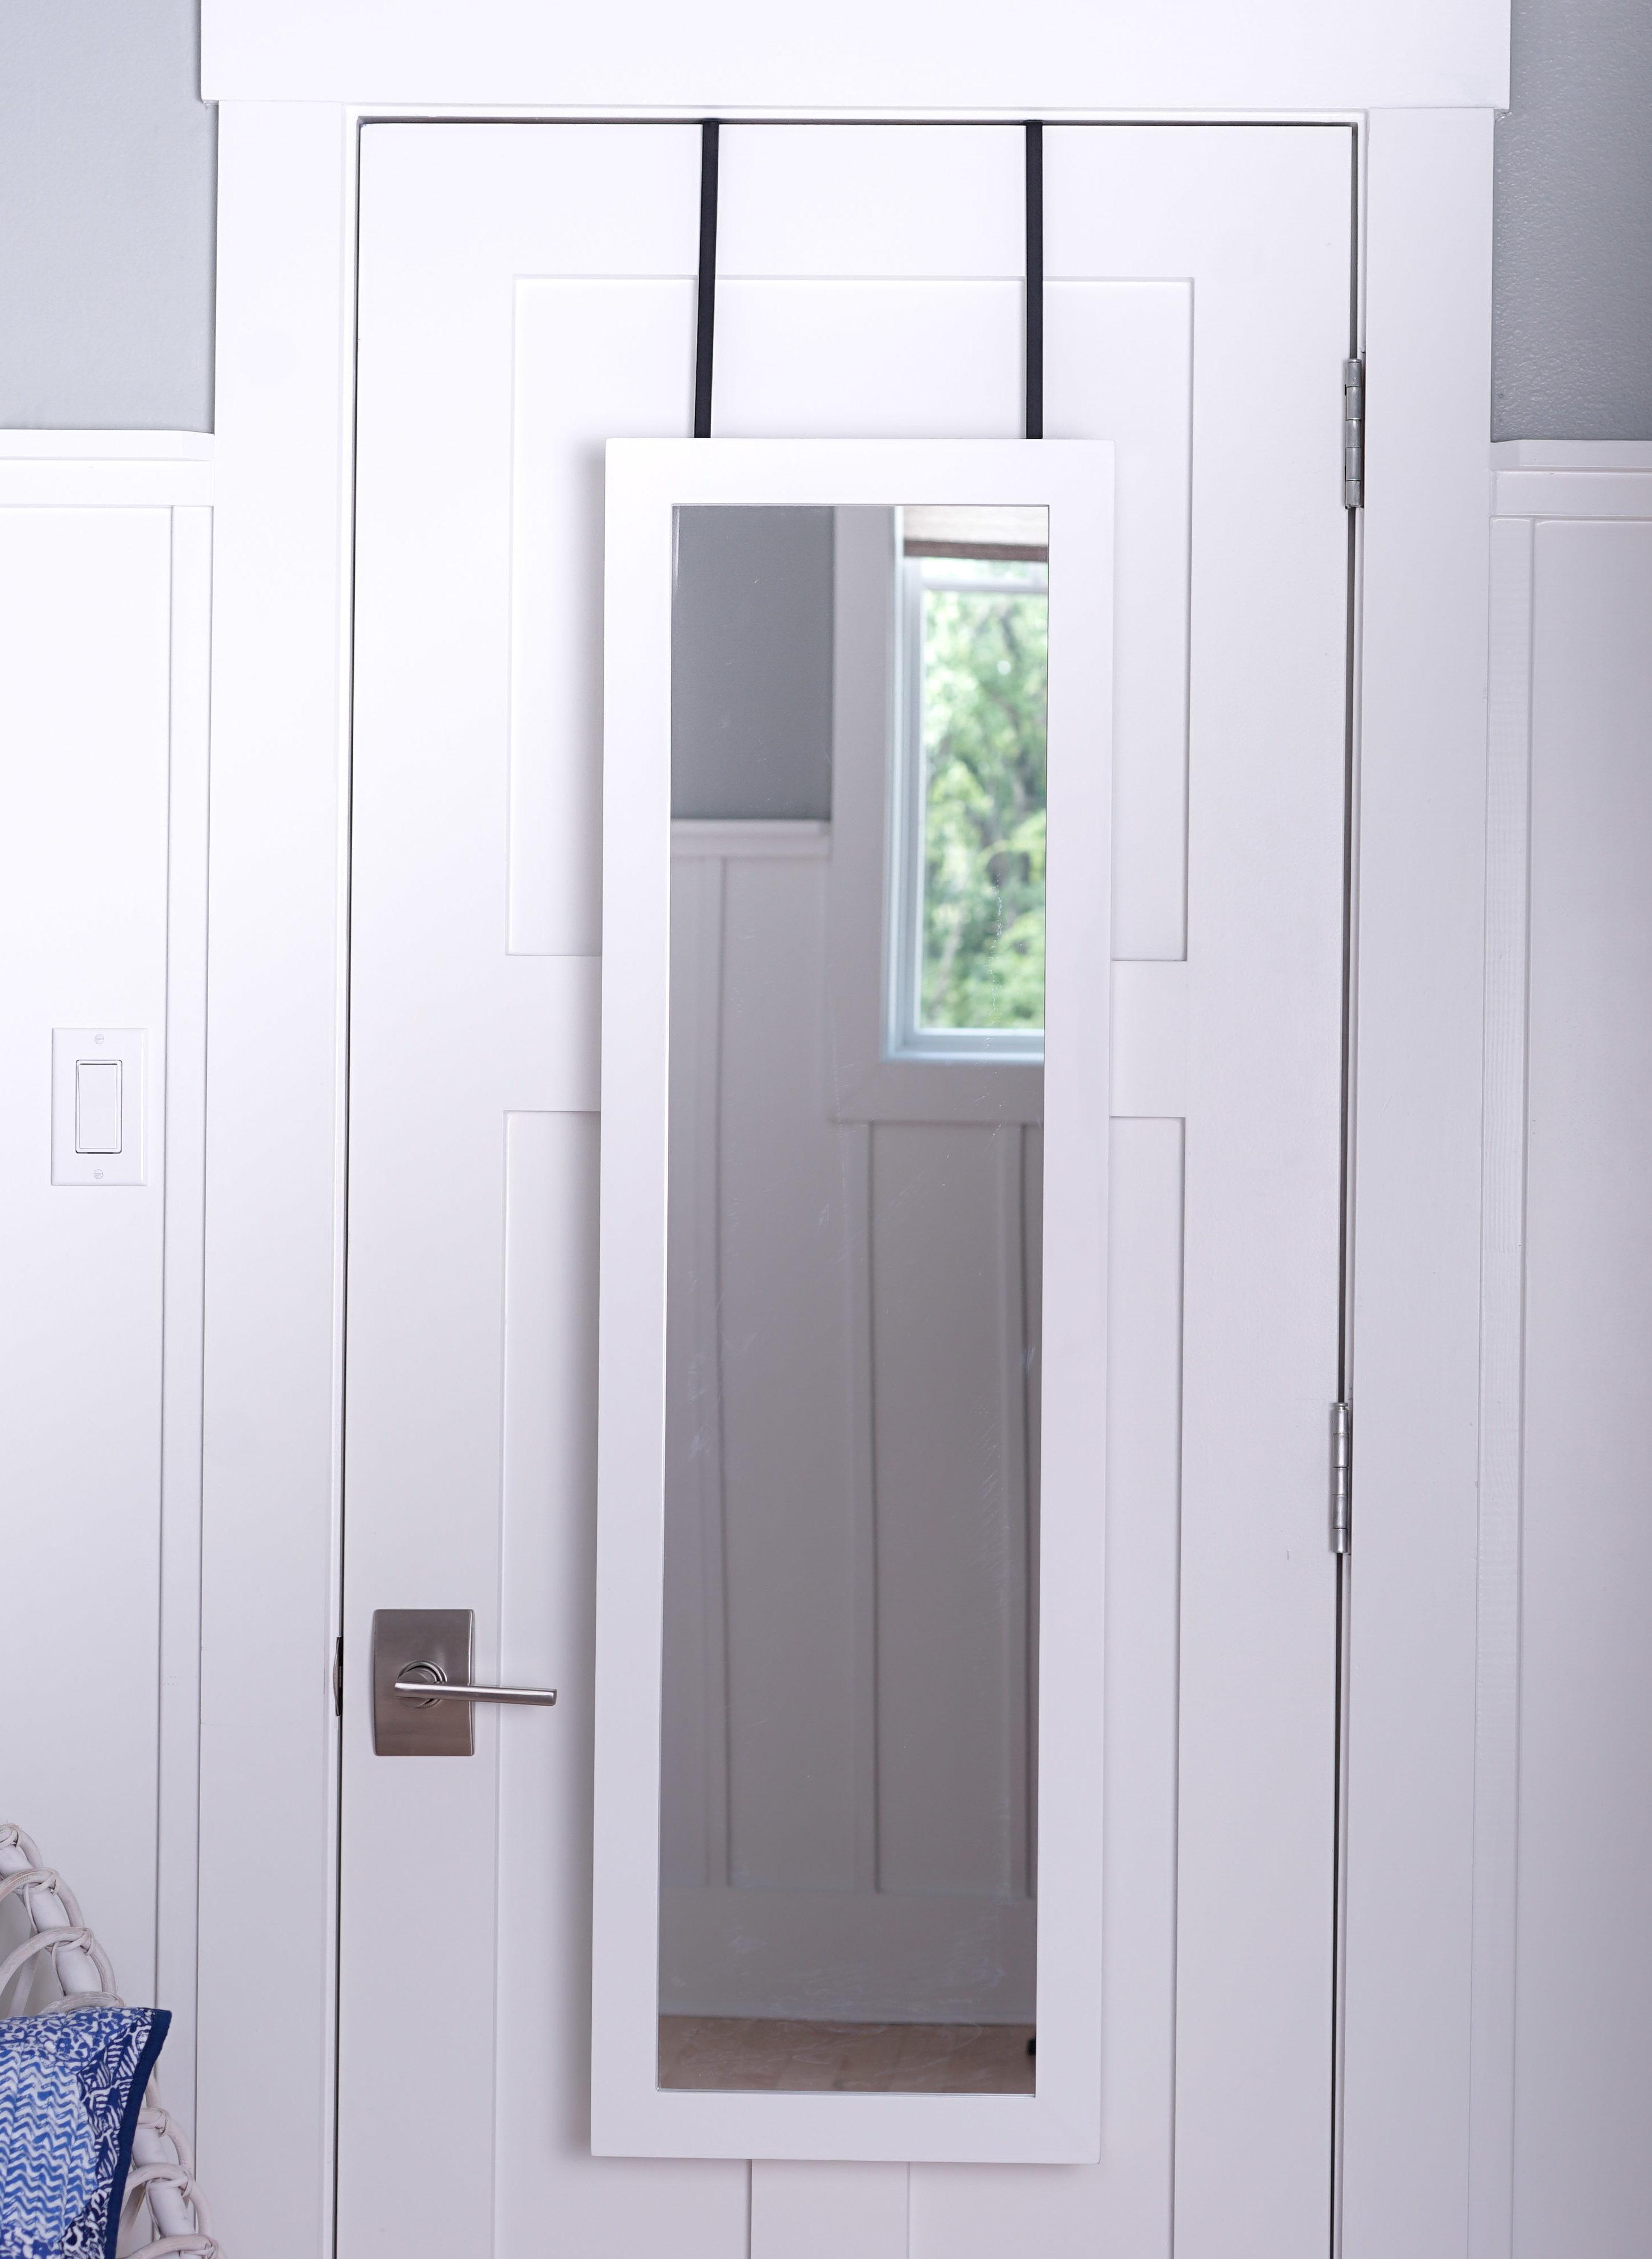 Over The Door 3 Tier Bathroom Towel Bar Rack Chrome W: Kampbell Over The Door Jewelry Armoire With Mirror~ Tuscan